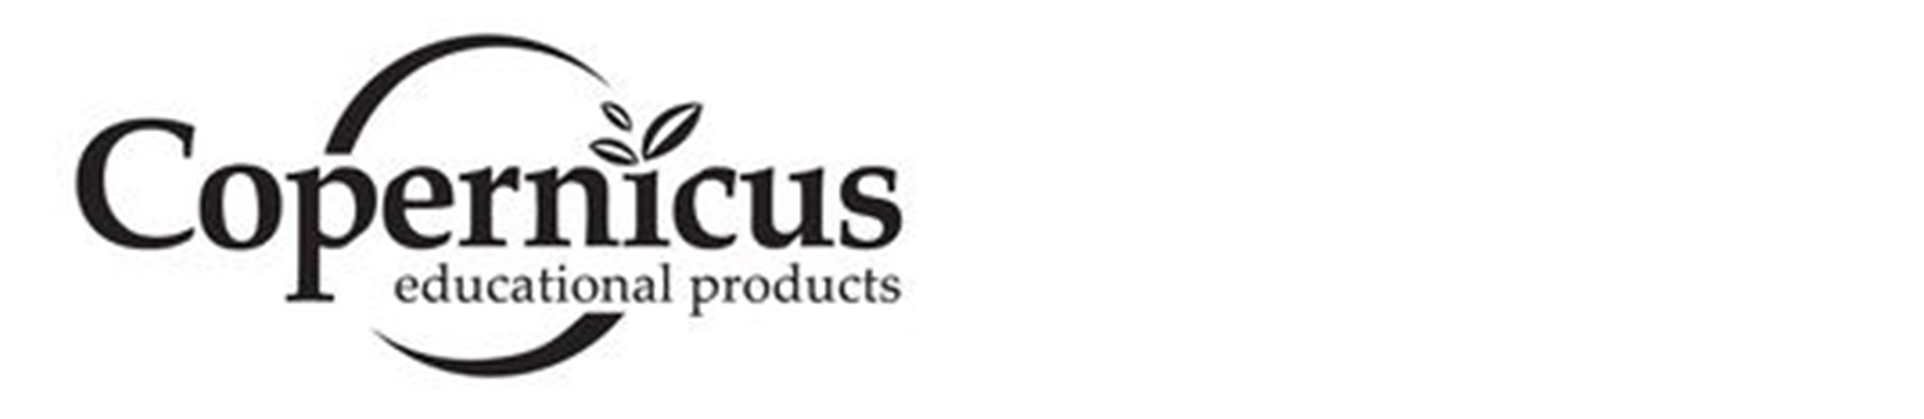 Copernicus Educational Products Inc.